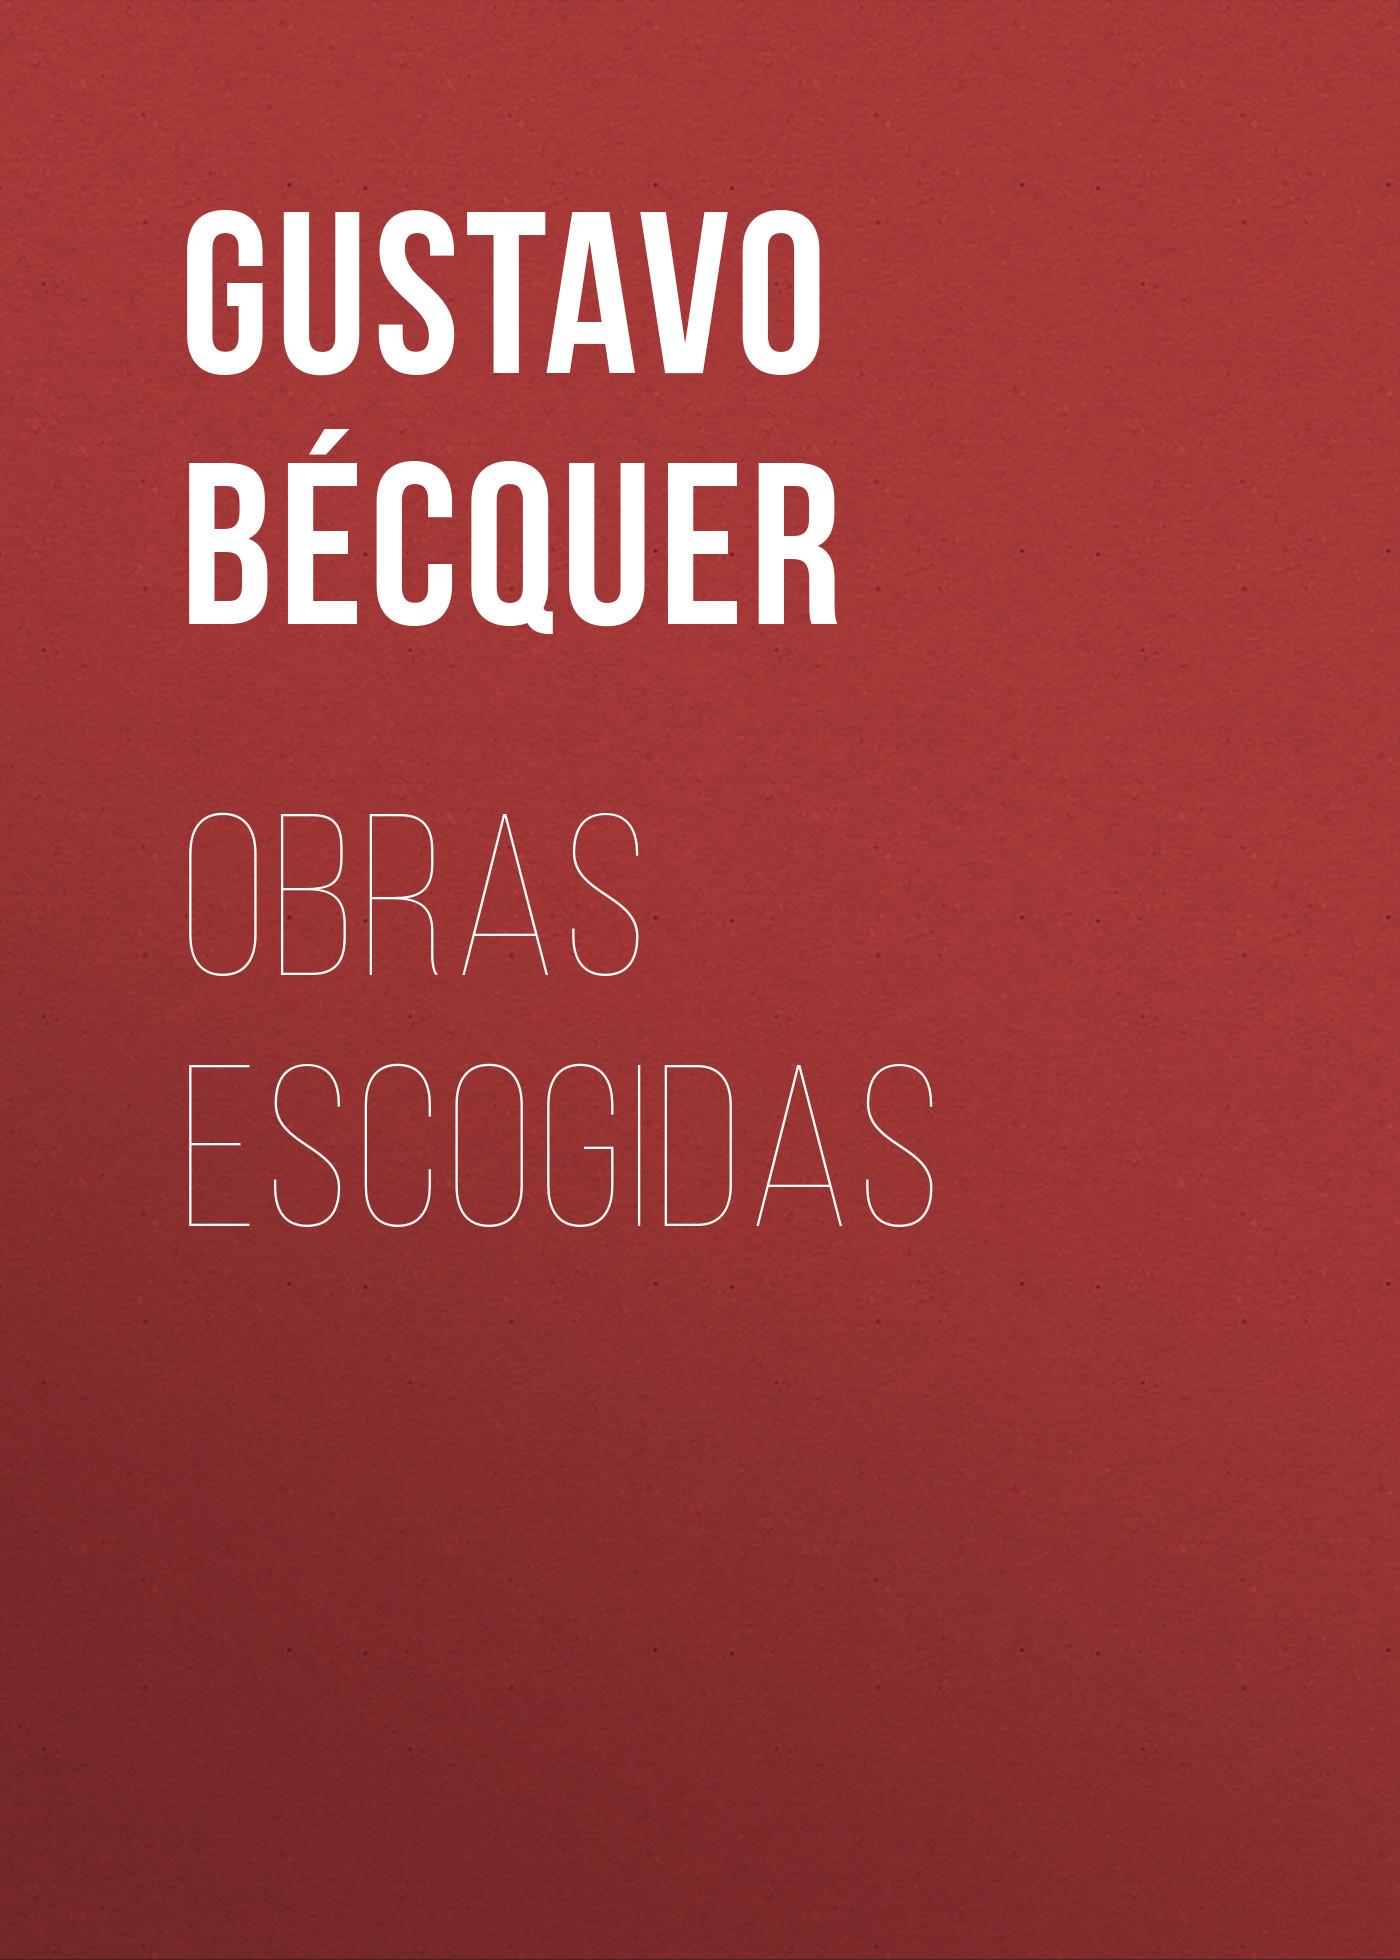 цены Bécquer Gustavo Adolfo Obras escogidas